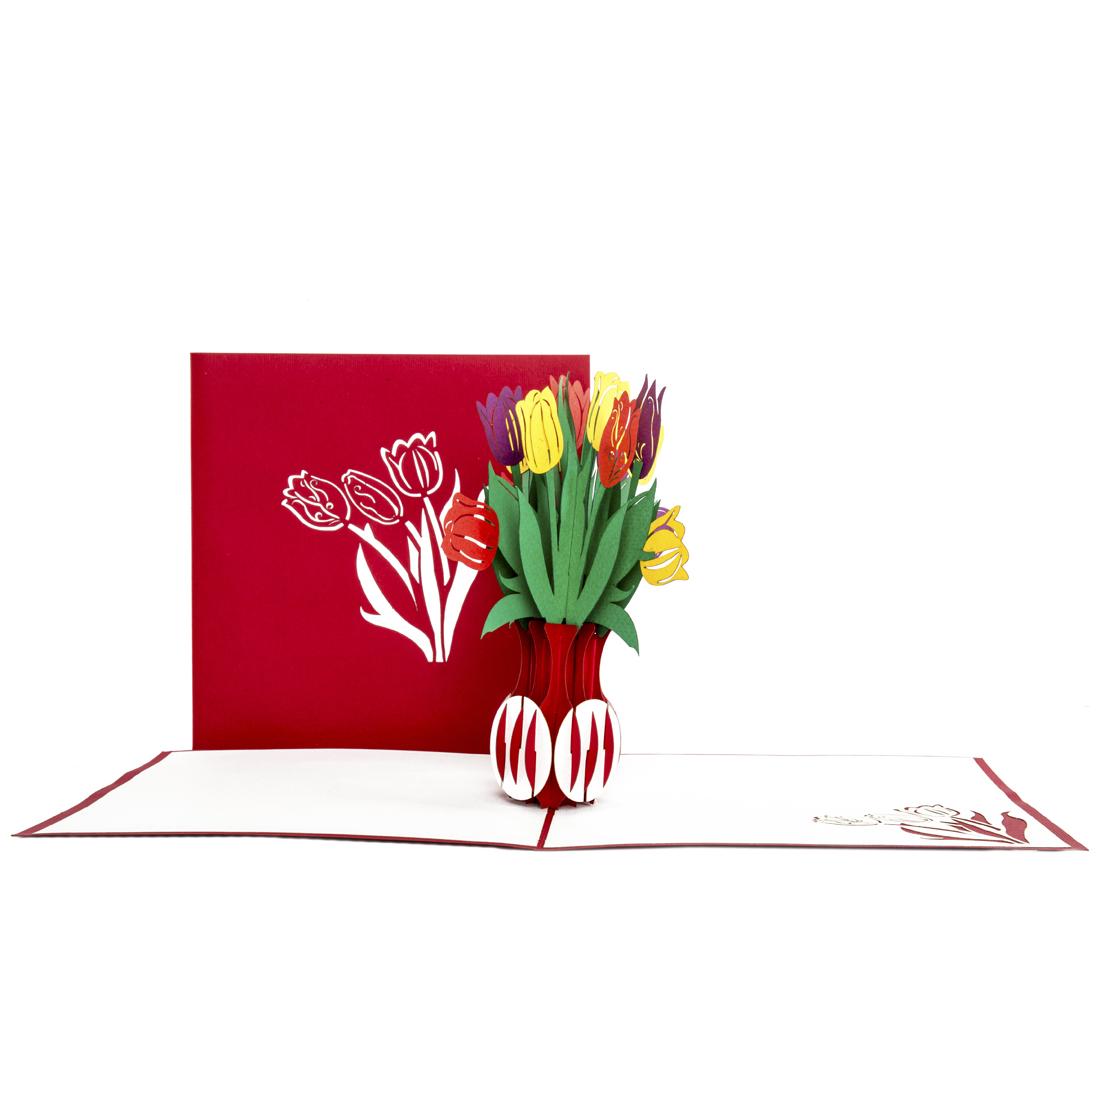 "Pop Up Karte ""Tulpen"" - Glückwunschkarte, Danksagung zum Geburtstag"